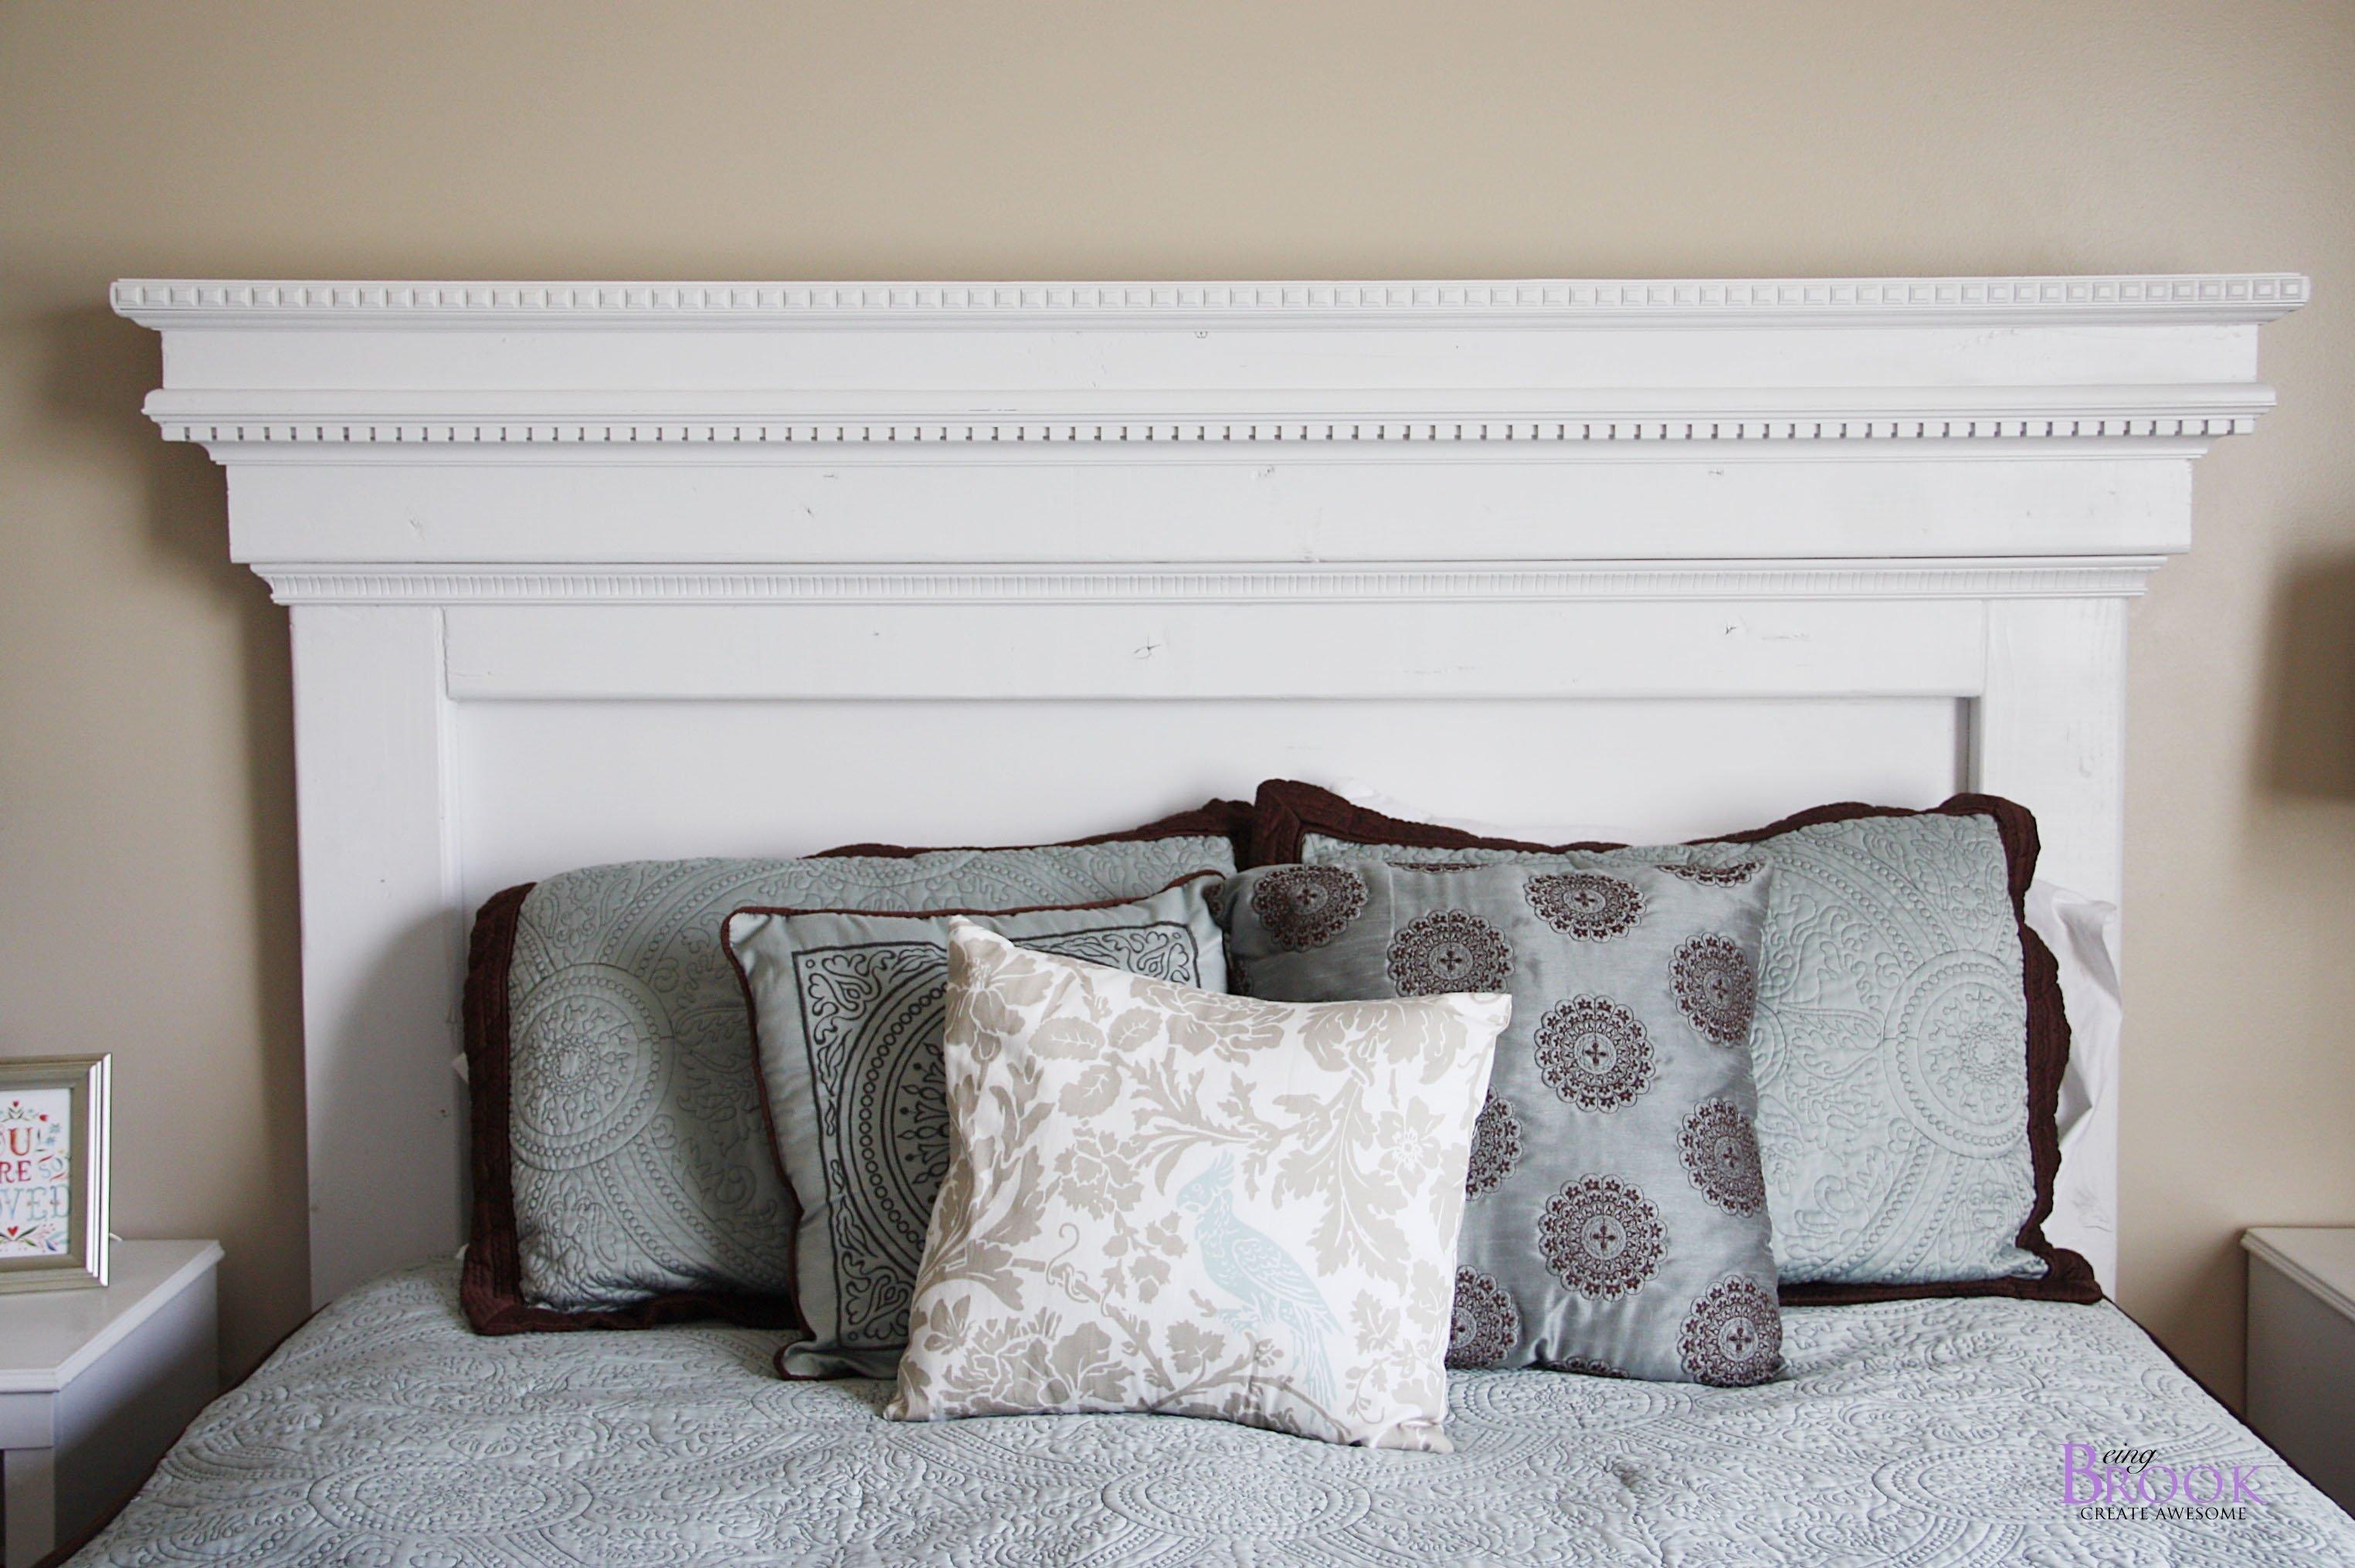 10 Fantastic Diy Headboard Ideas For Queen Beds fresh diy headboard ideas for twin beds 4654 2020